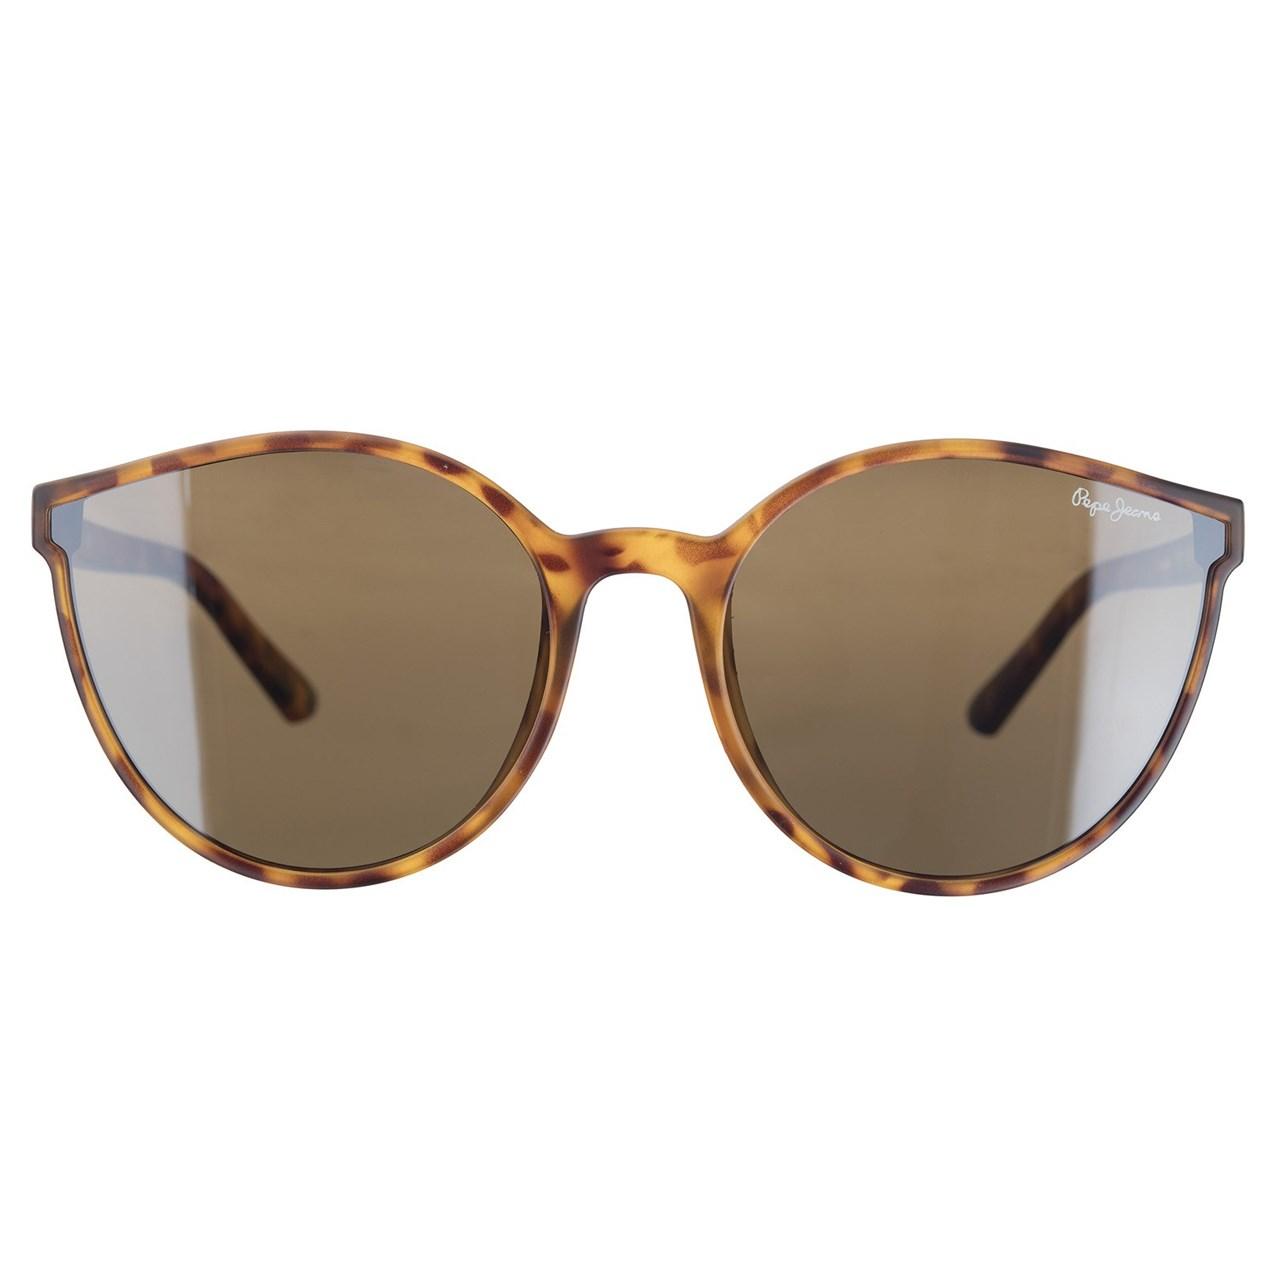 عینک آفتابی پپه جینز مدل PJ7272C260